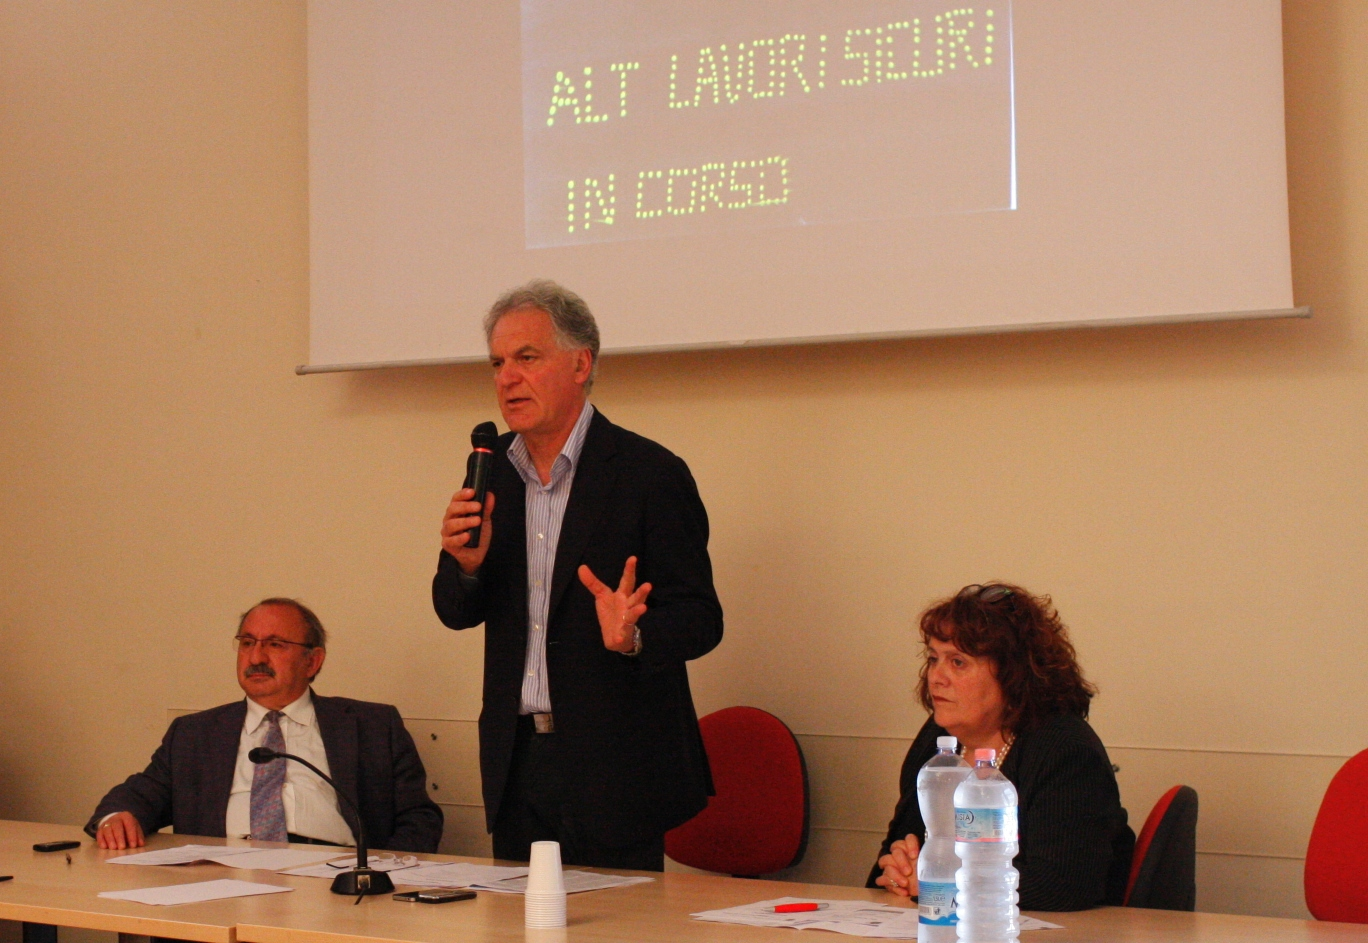 Pres. Celani - Ass. Petrucci - Menicozzi